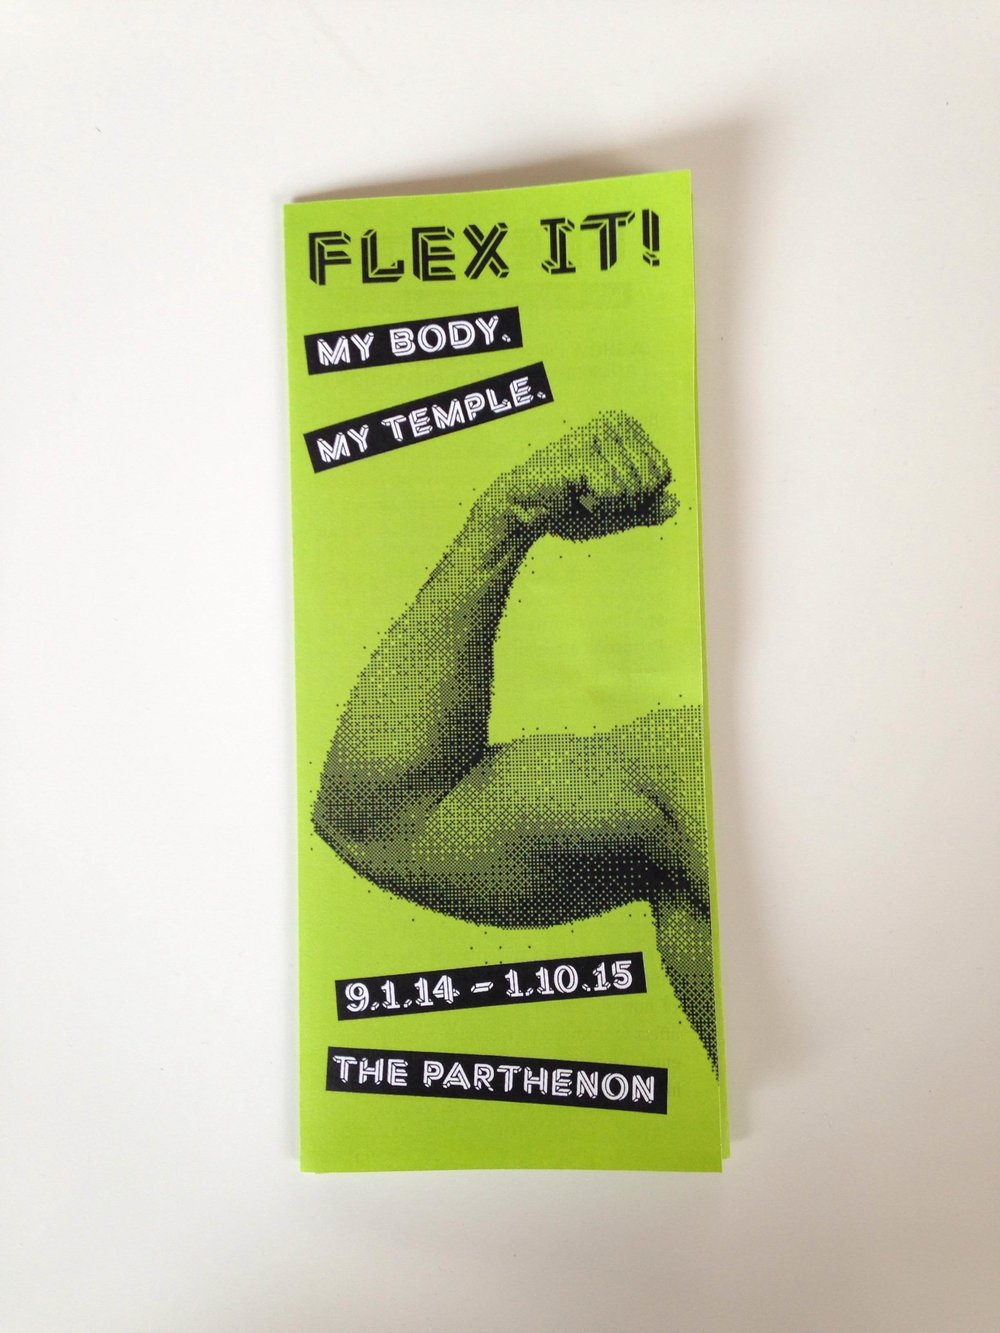 Flex it trifold.JPG